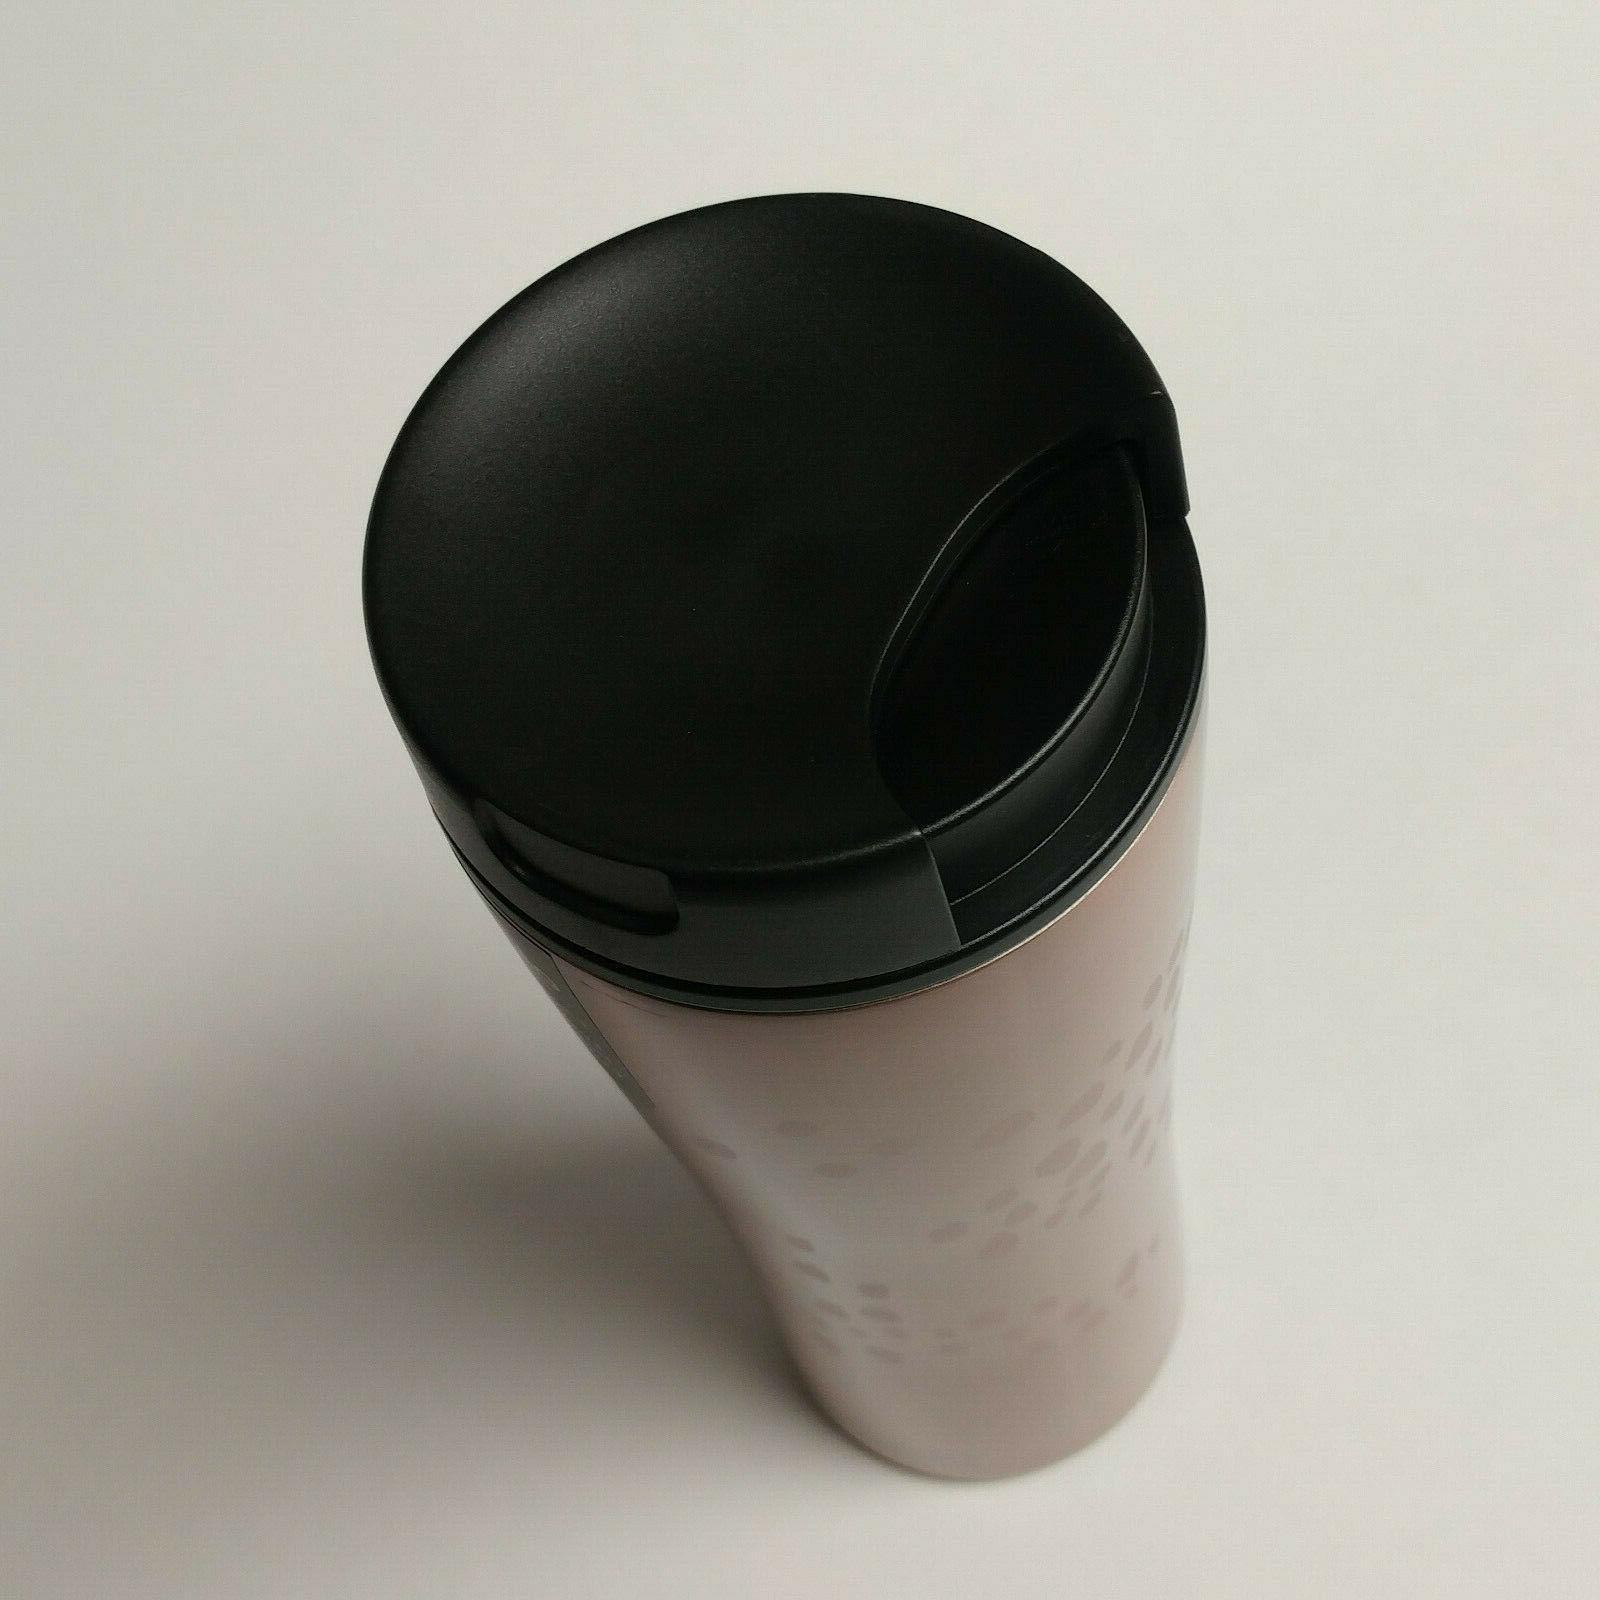 black 16oz travel tumbler cup Cafe